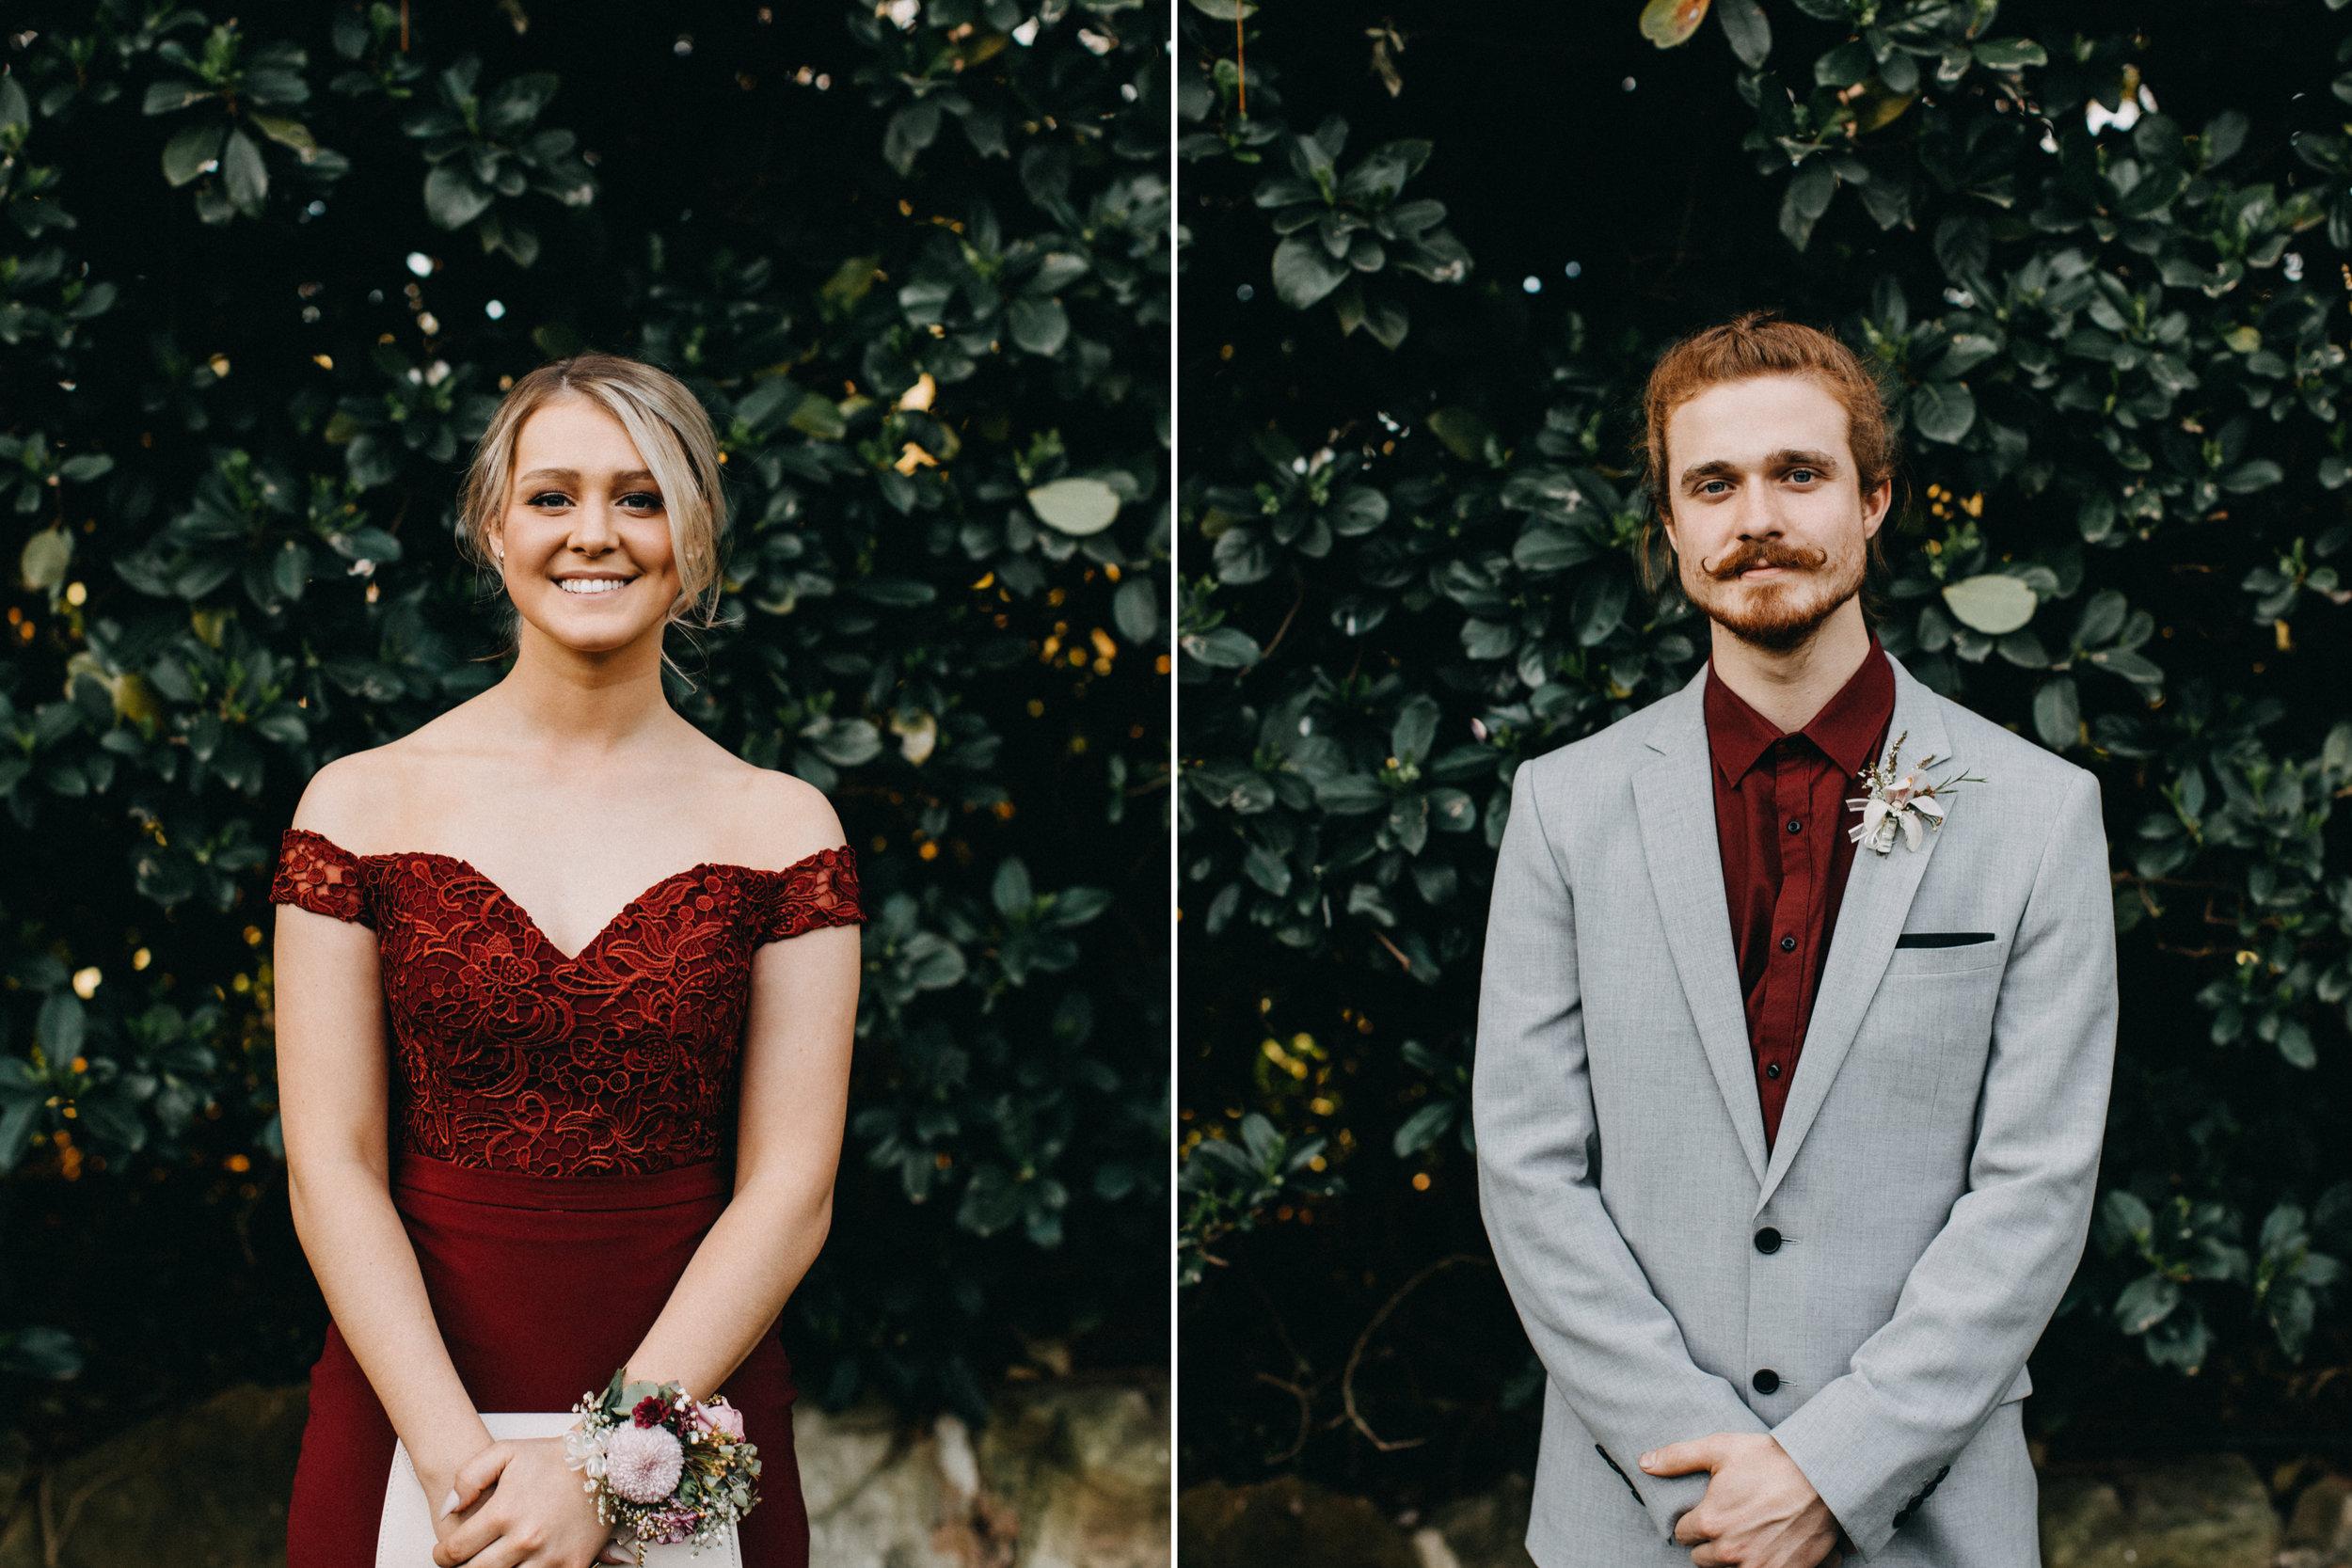 burnham-grove-camden-wedding-emilyobrienphotography-4.jpg